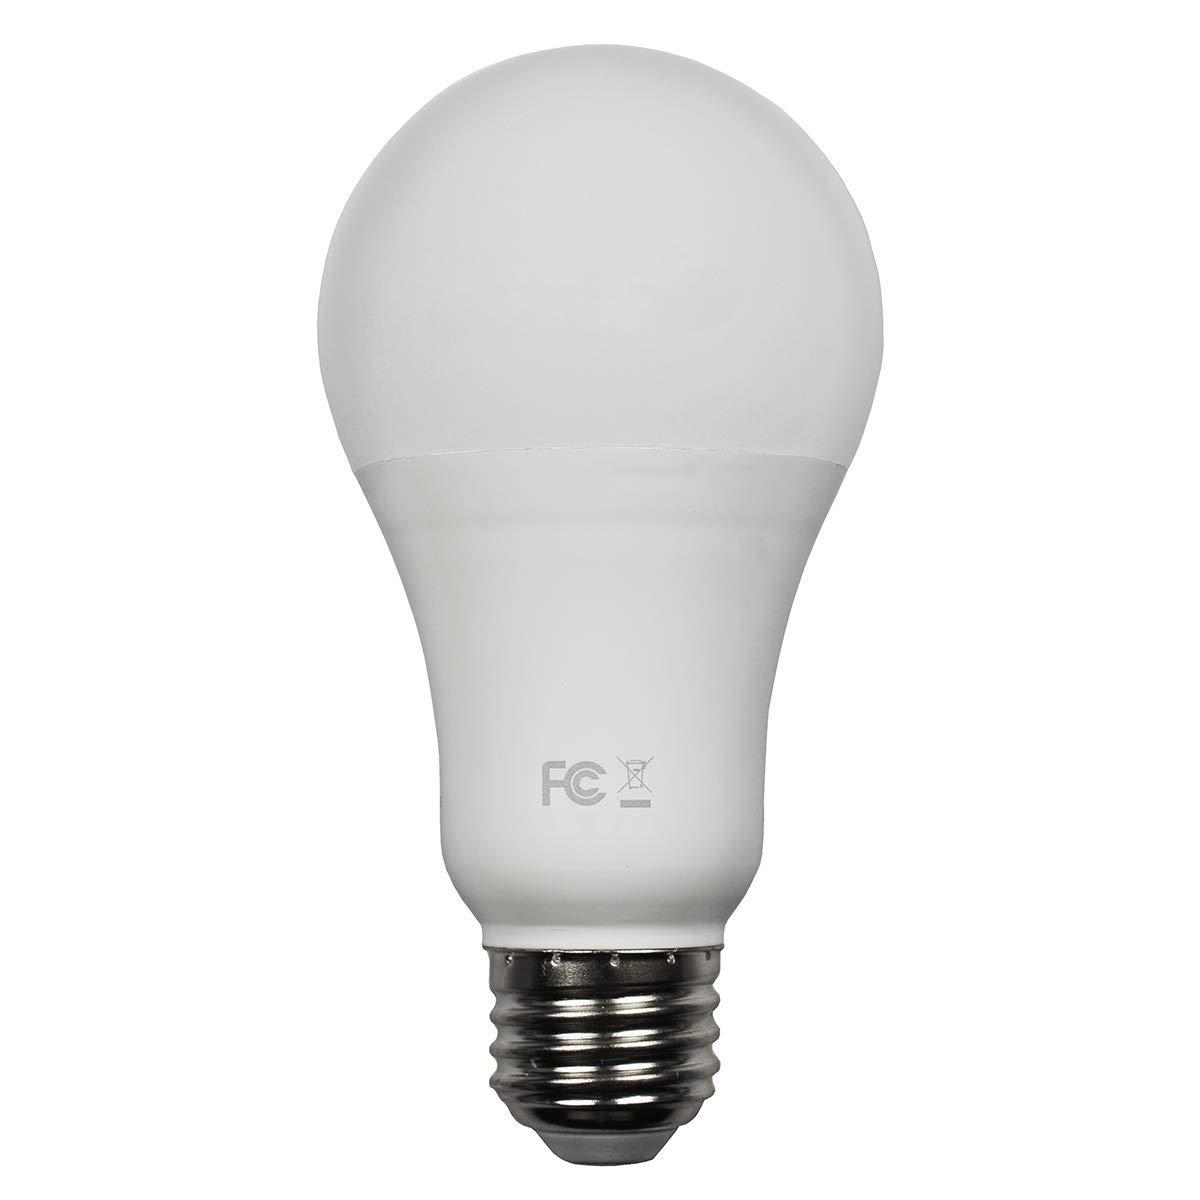 LED-A21OM-UV-5K Pure-White 120-277V - Volts: 120-277V, Watts: 13W, Type: LED A21